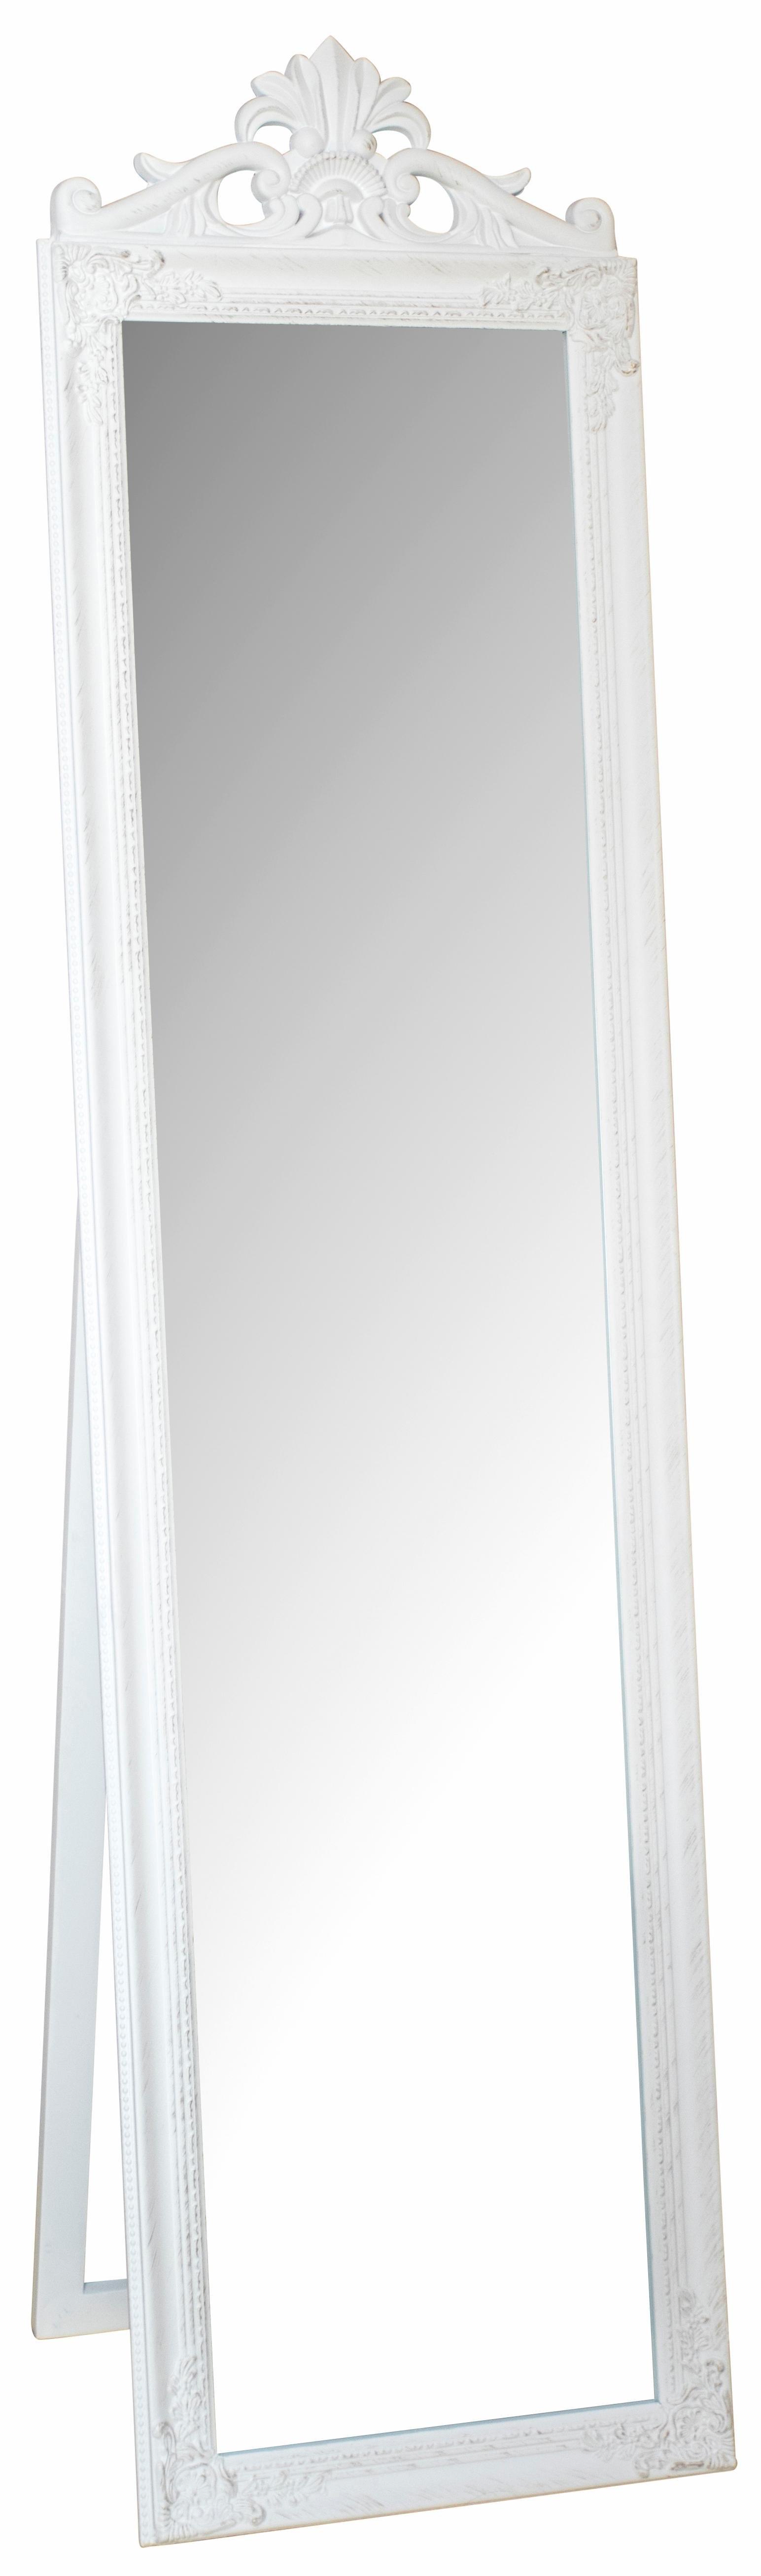 home affaire verticale spiegel king bestellen bij otto. Black Bedroom Furniture Sets. Home Design Ideas